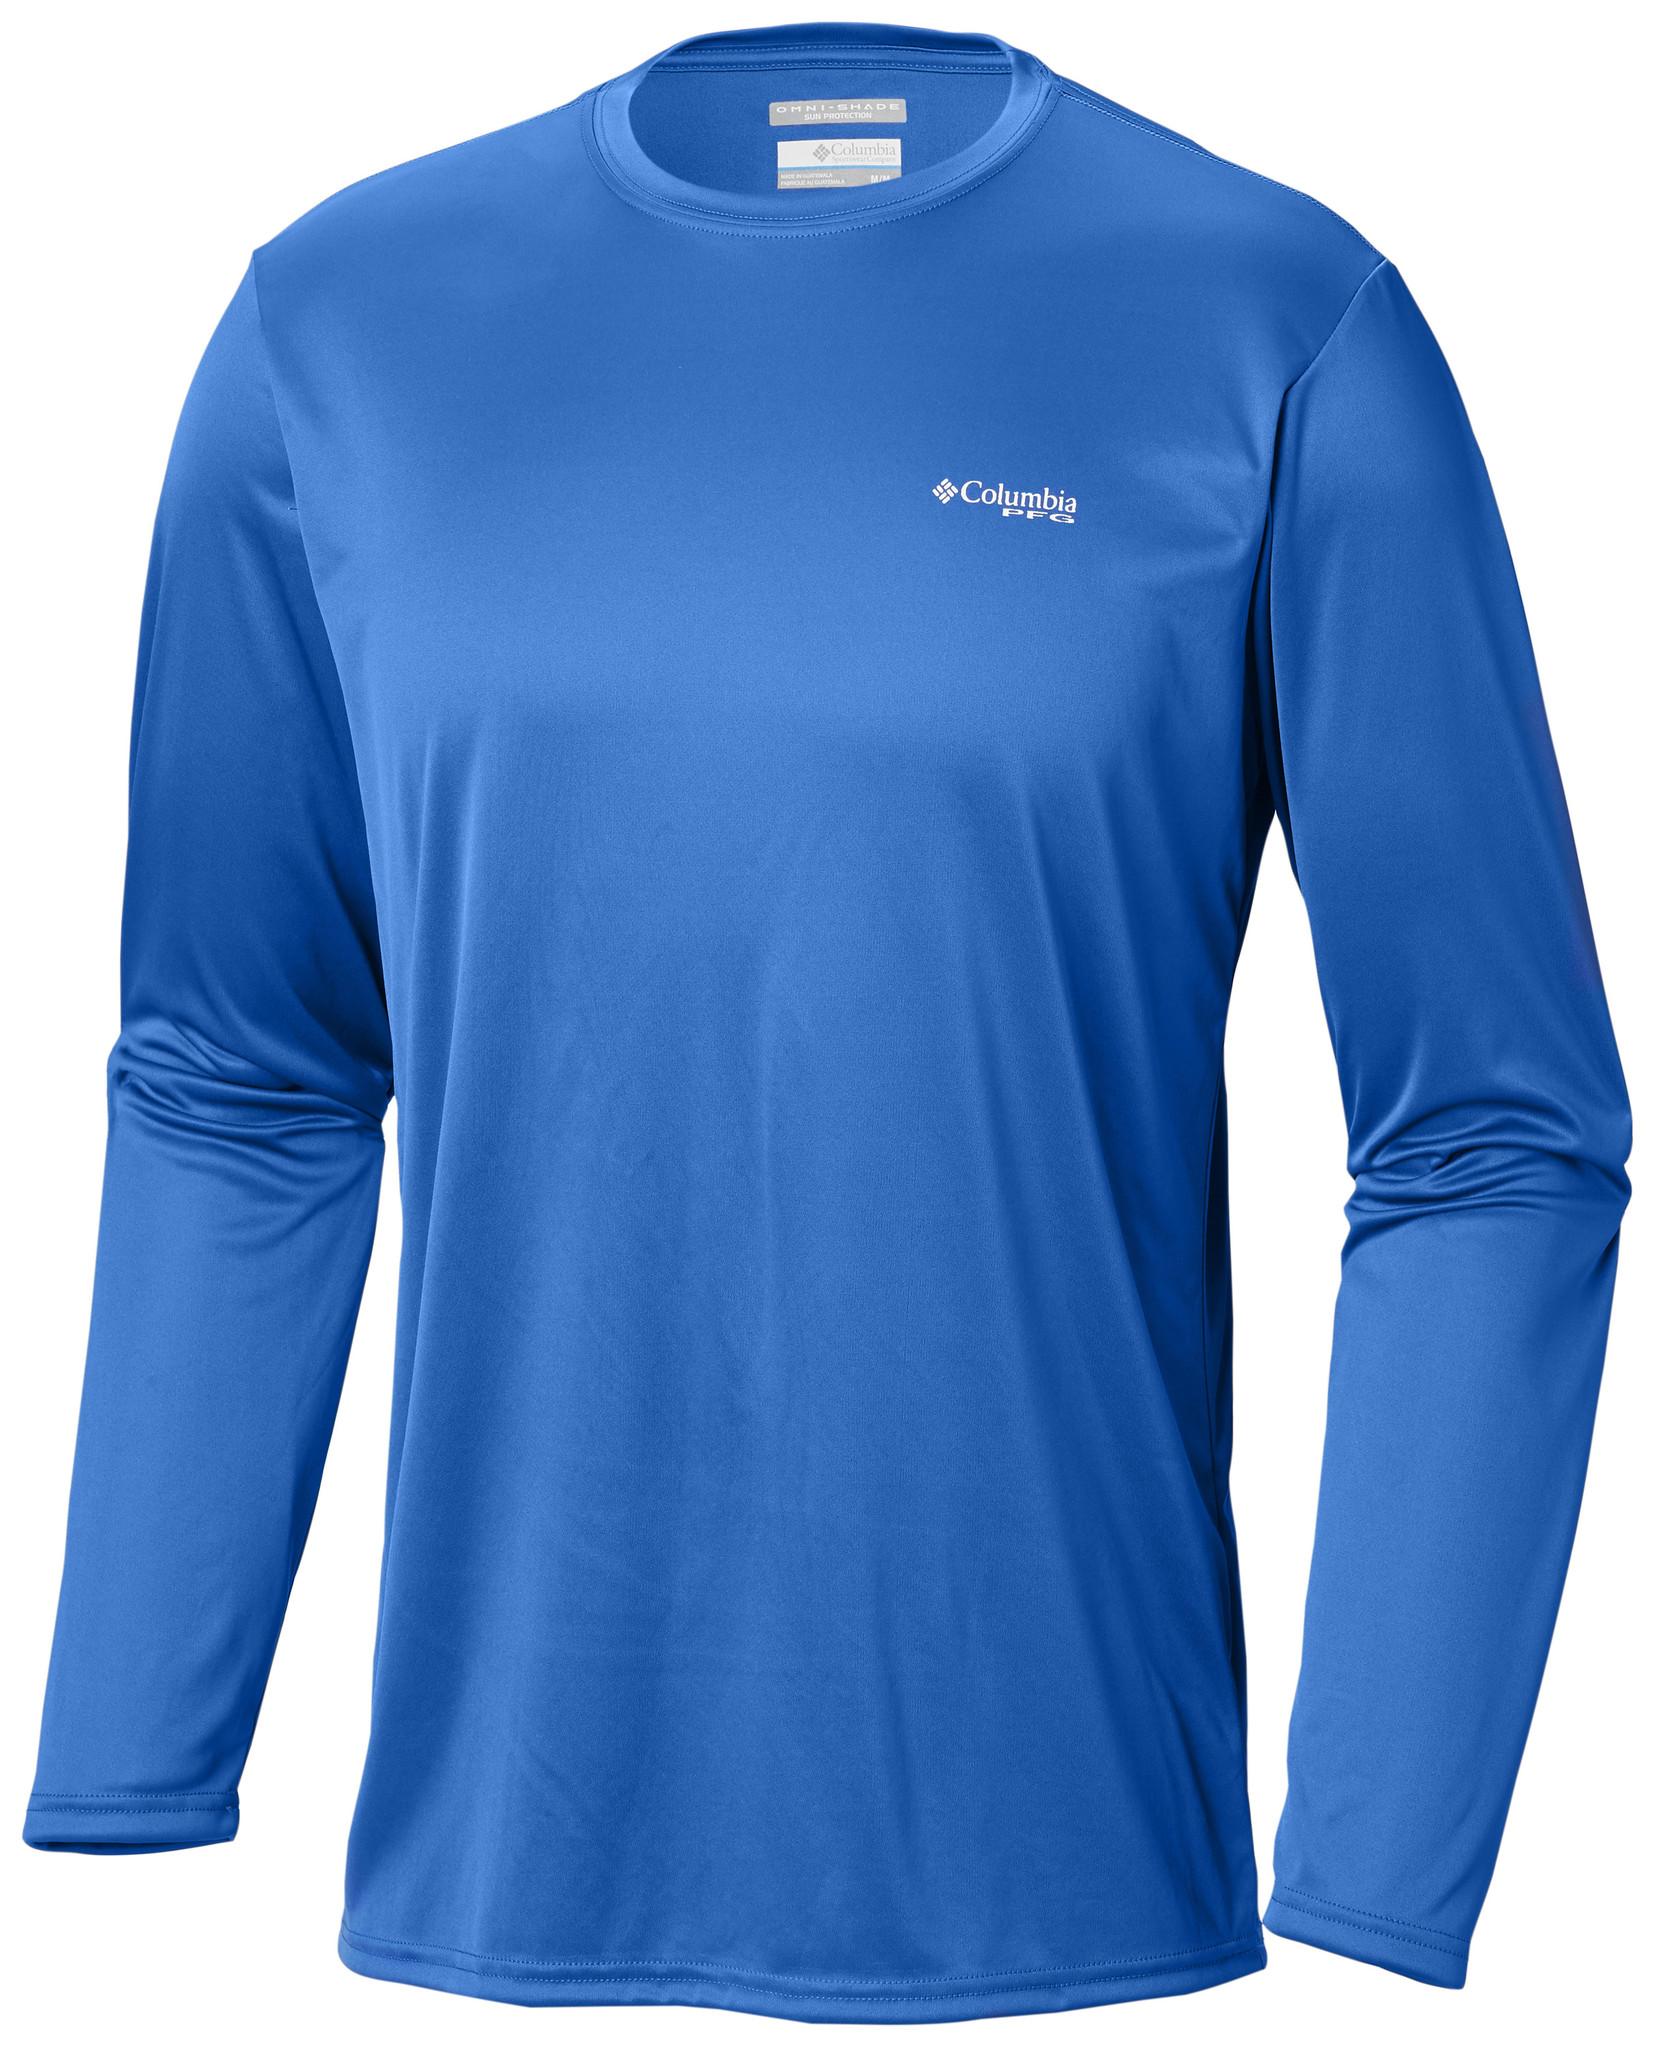 Columbia Sportswear Men's Terminal Tackle PFG Triangle Flag™ Long Sleeve Shirt